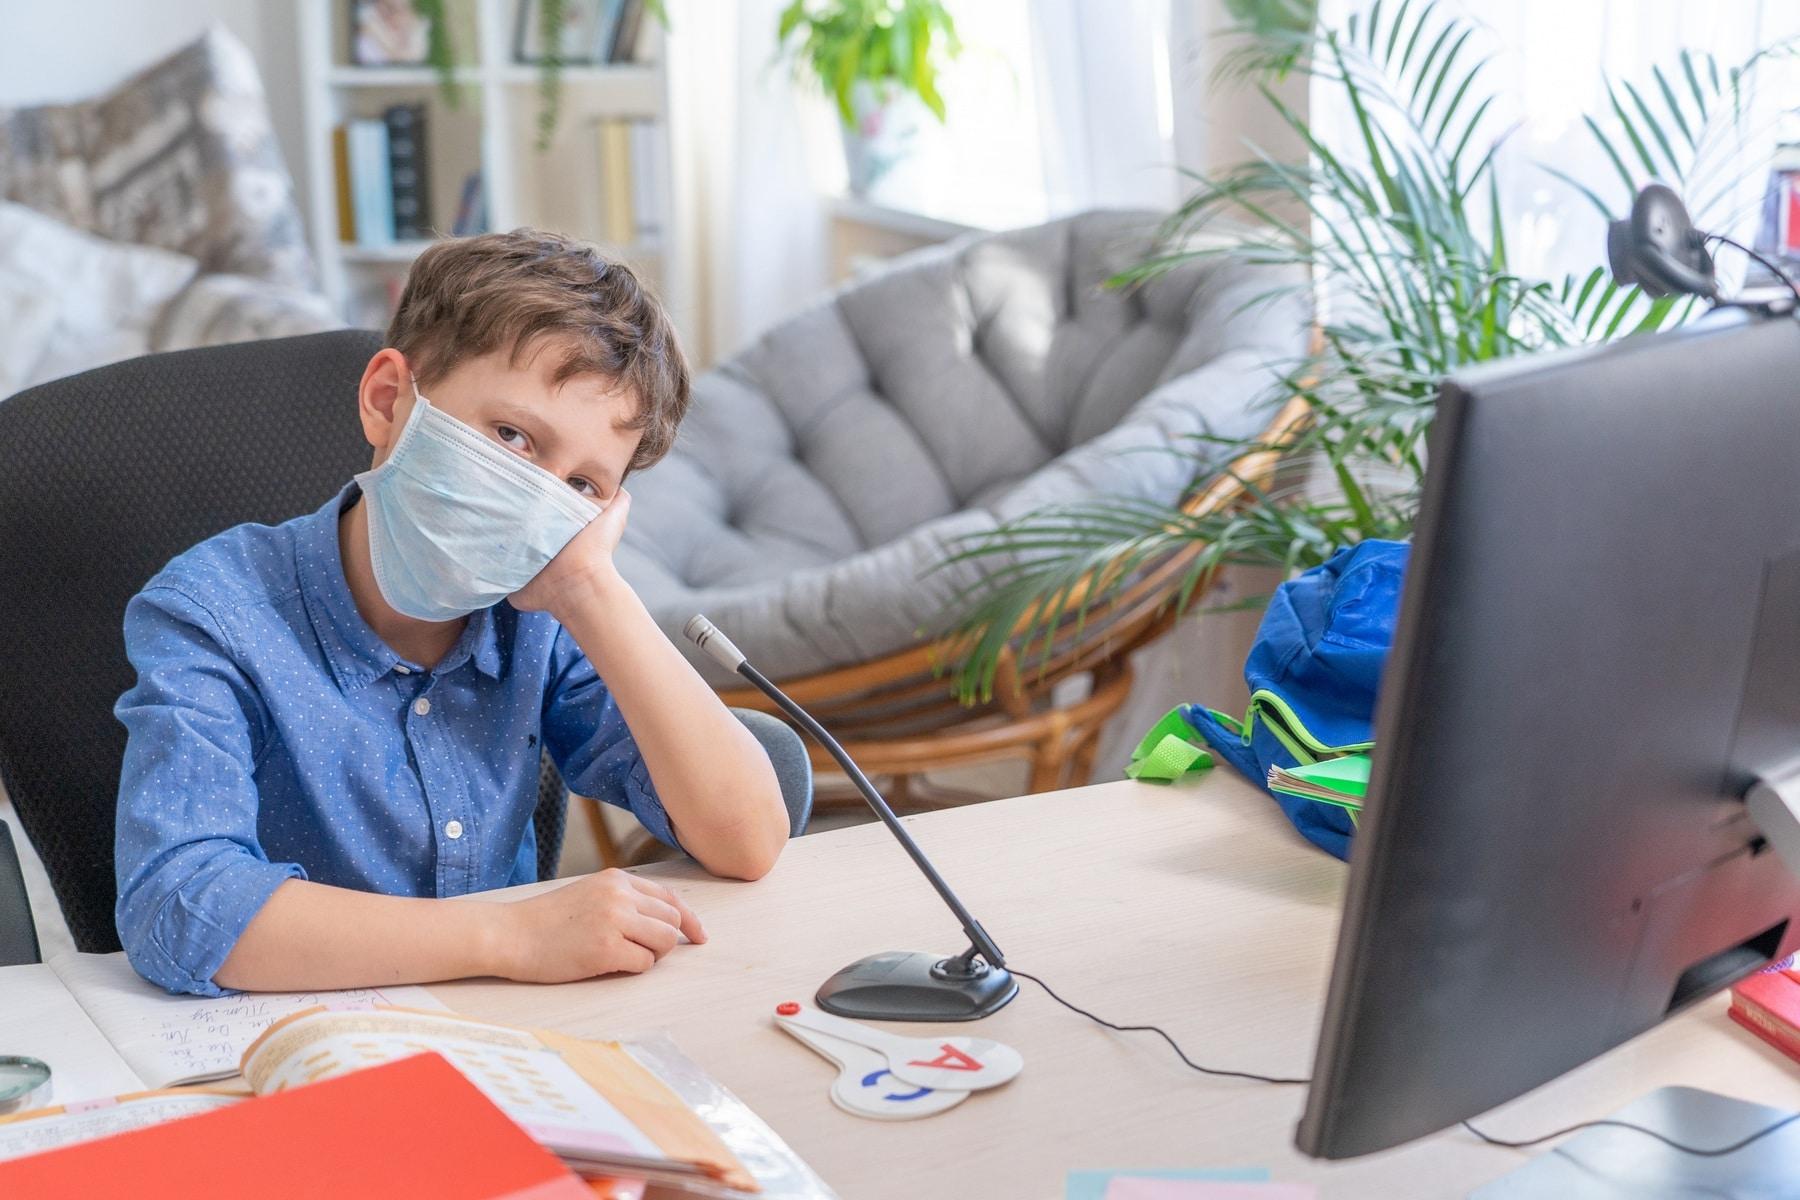 Sad boy in face mask using computer doing homework during coronavirus quarantine